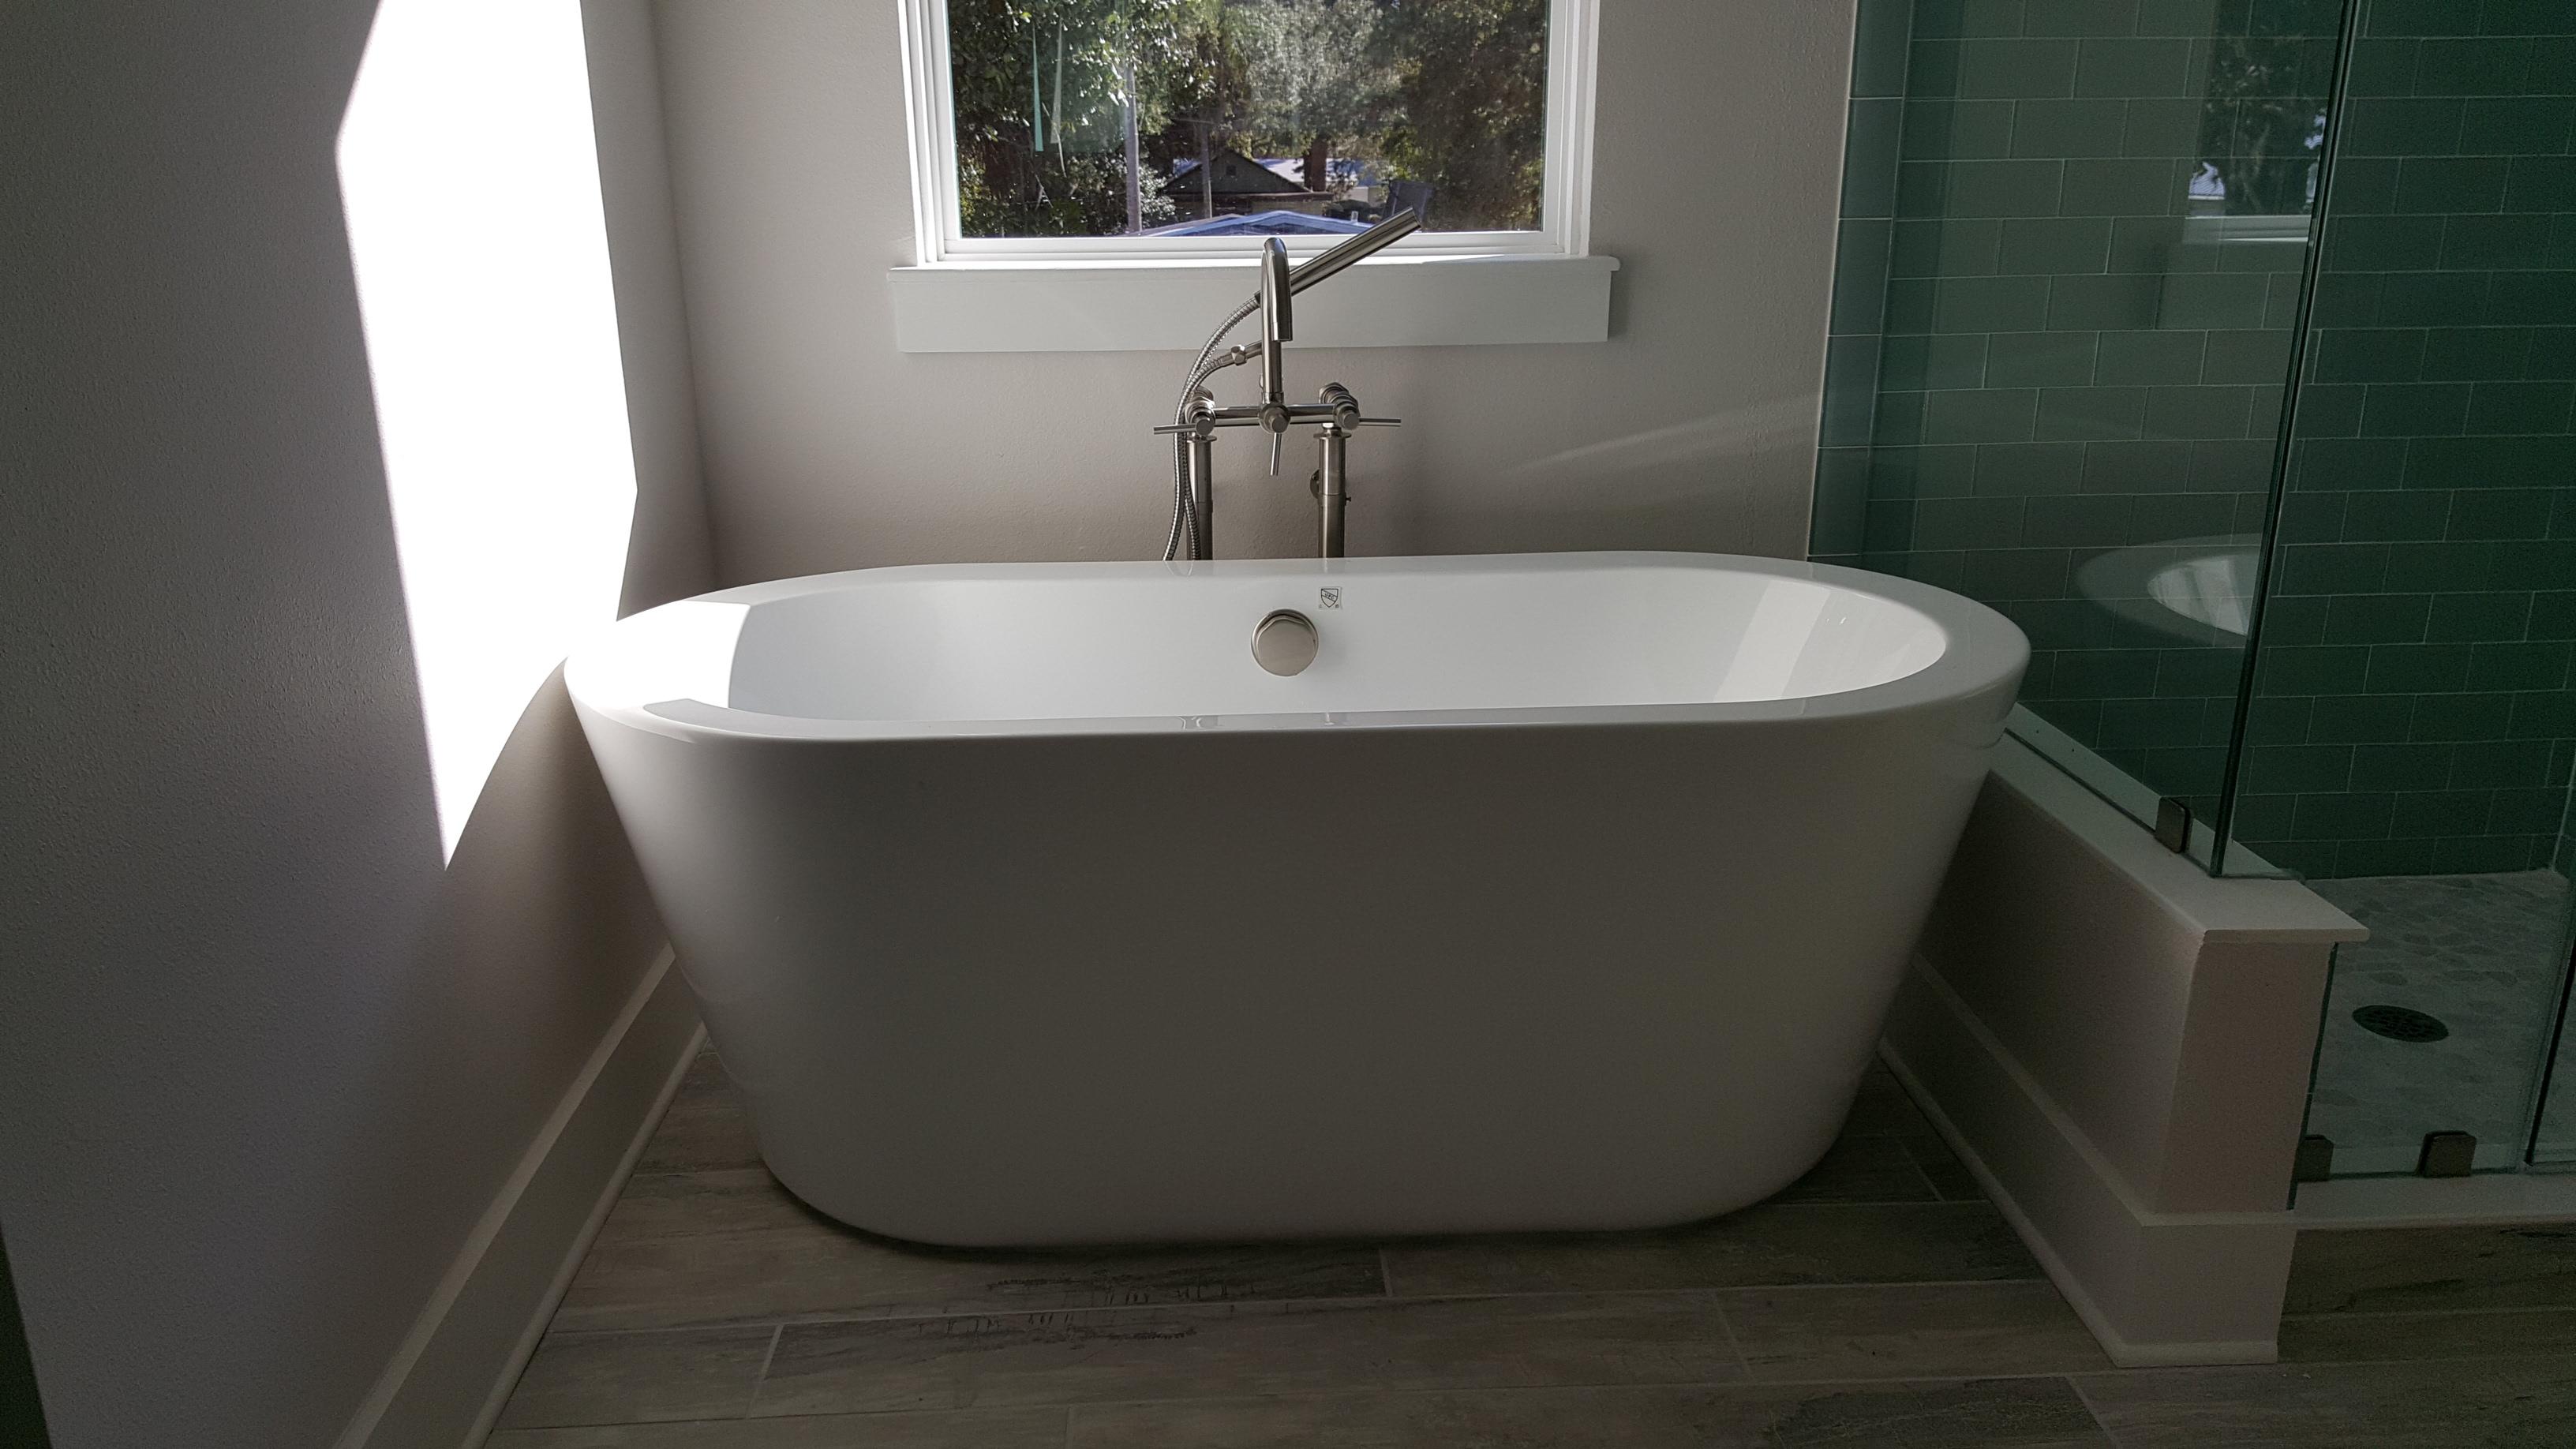 jacuzzi home alcove improvement bathtub x signature wayfair pdx